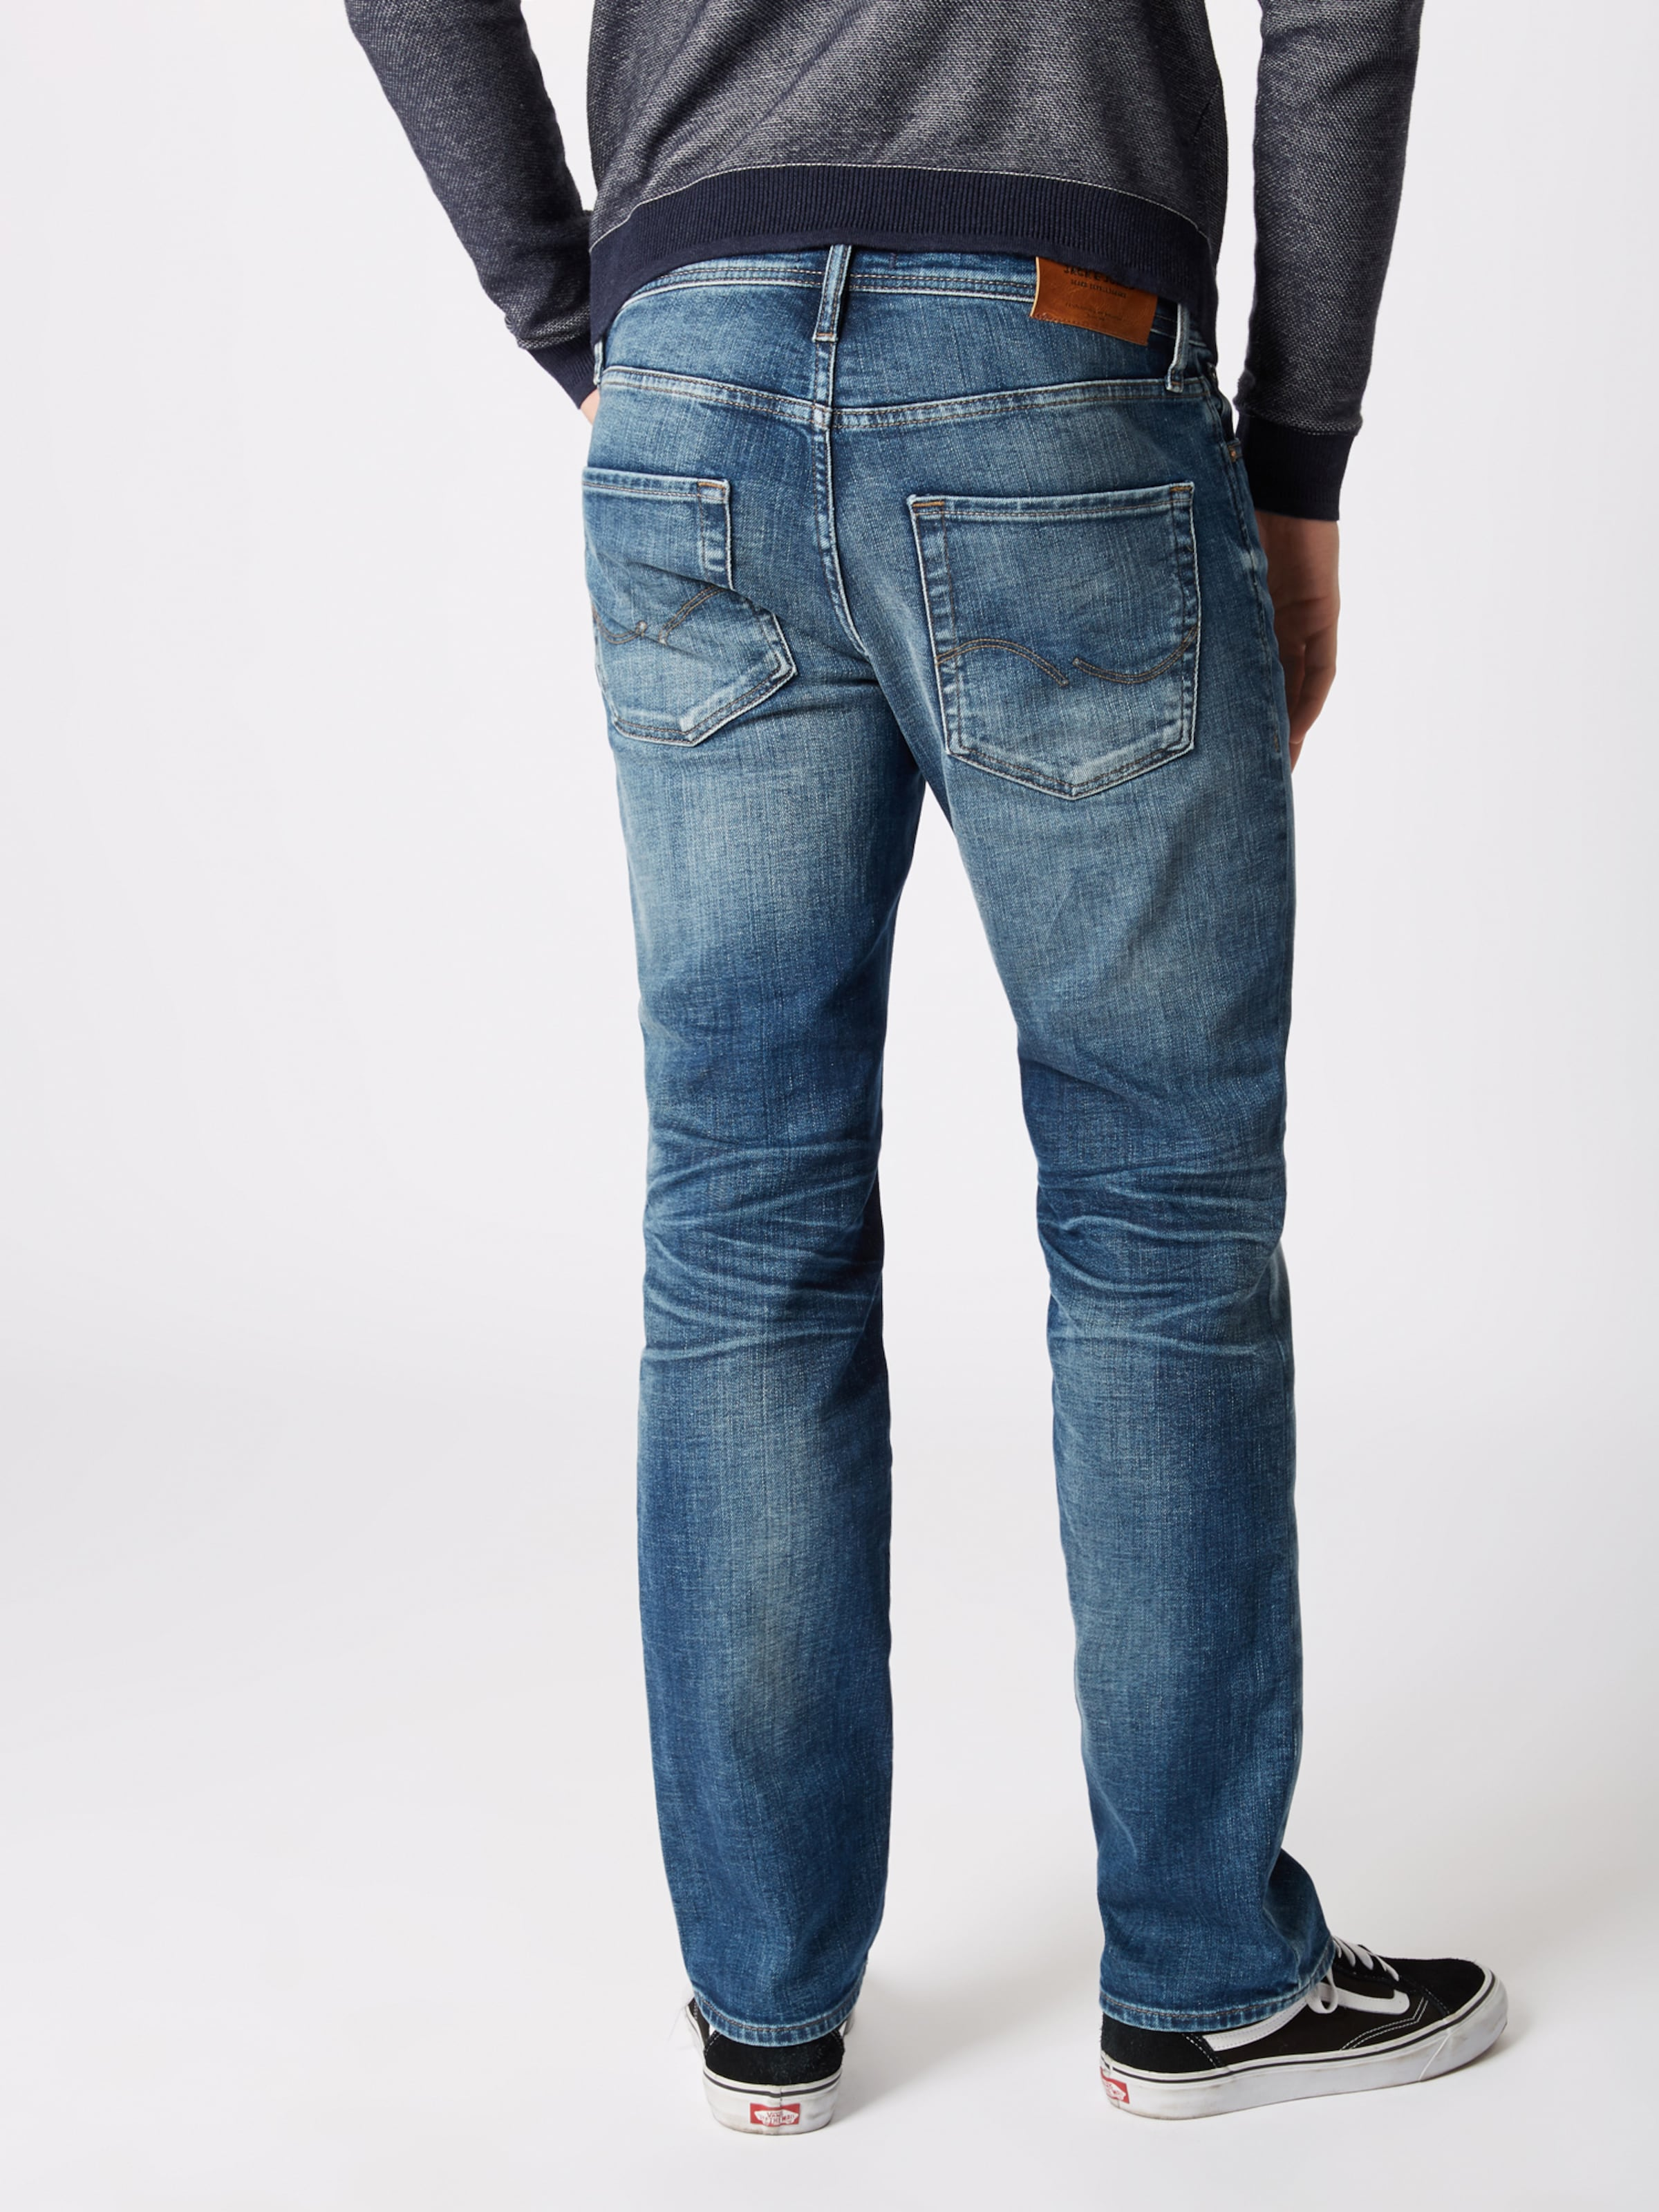 Jeans 'clark' Jones Denim In Jackamp; Blue 34qj5ARL